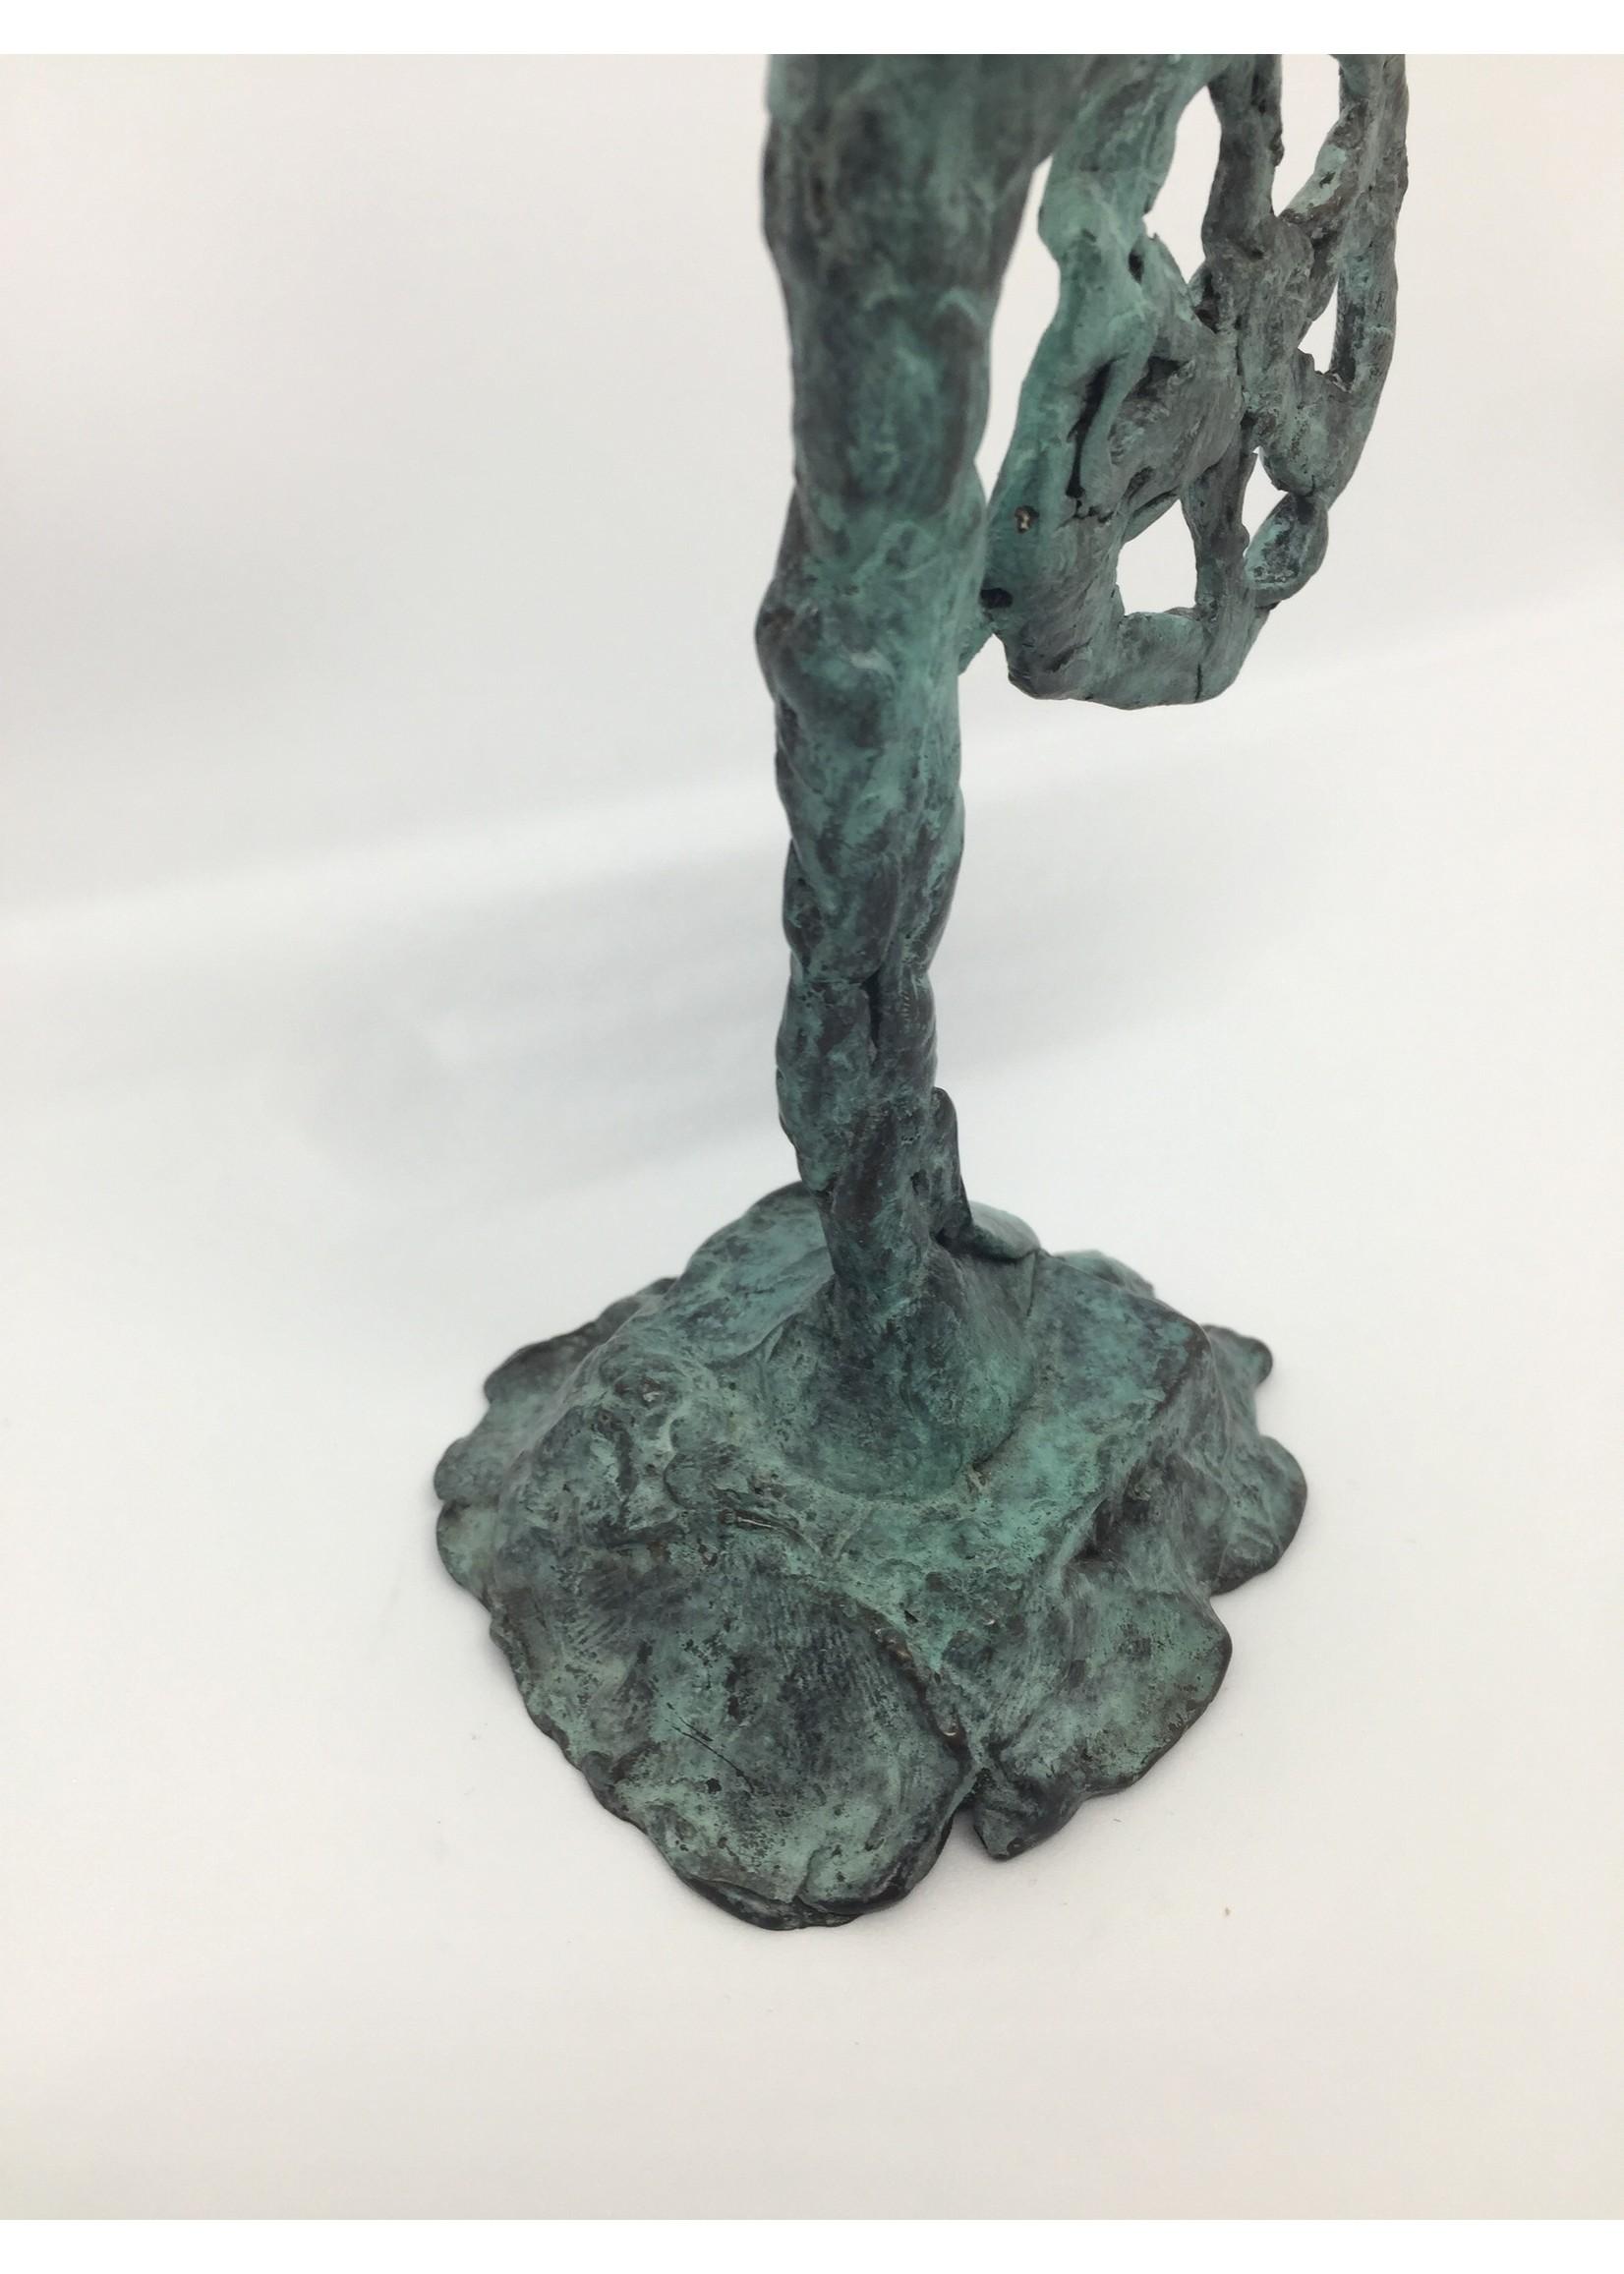 'Die Reise' - Denise Kamp (Bronze)